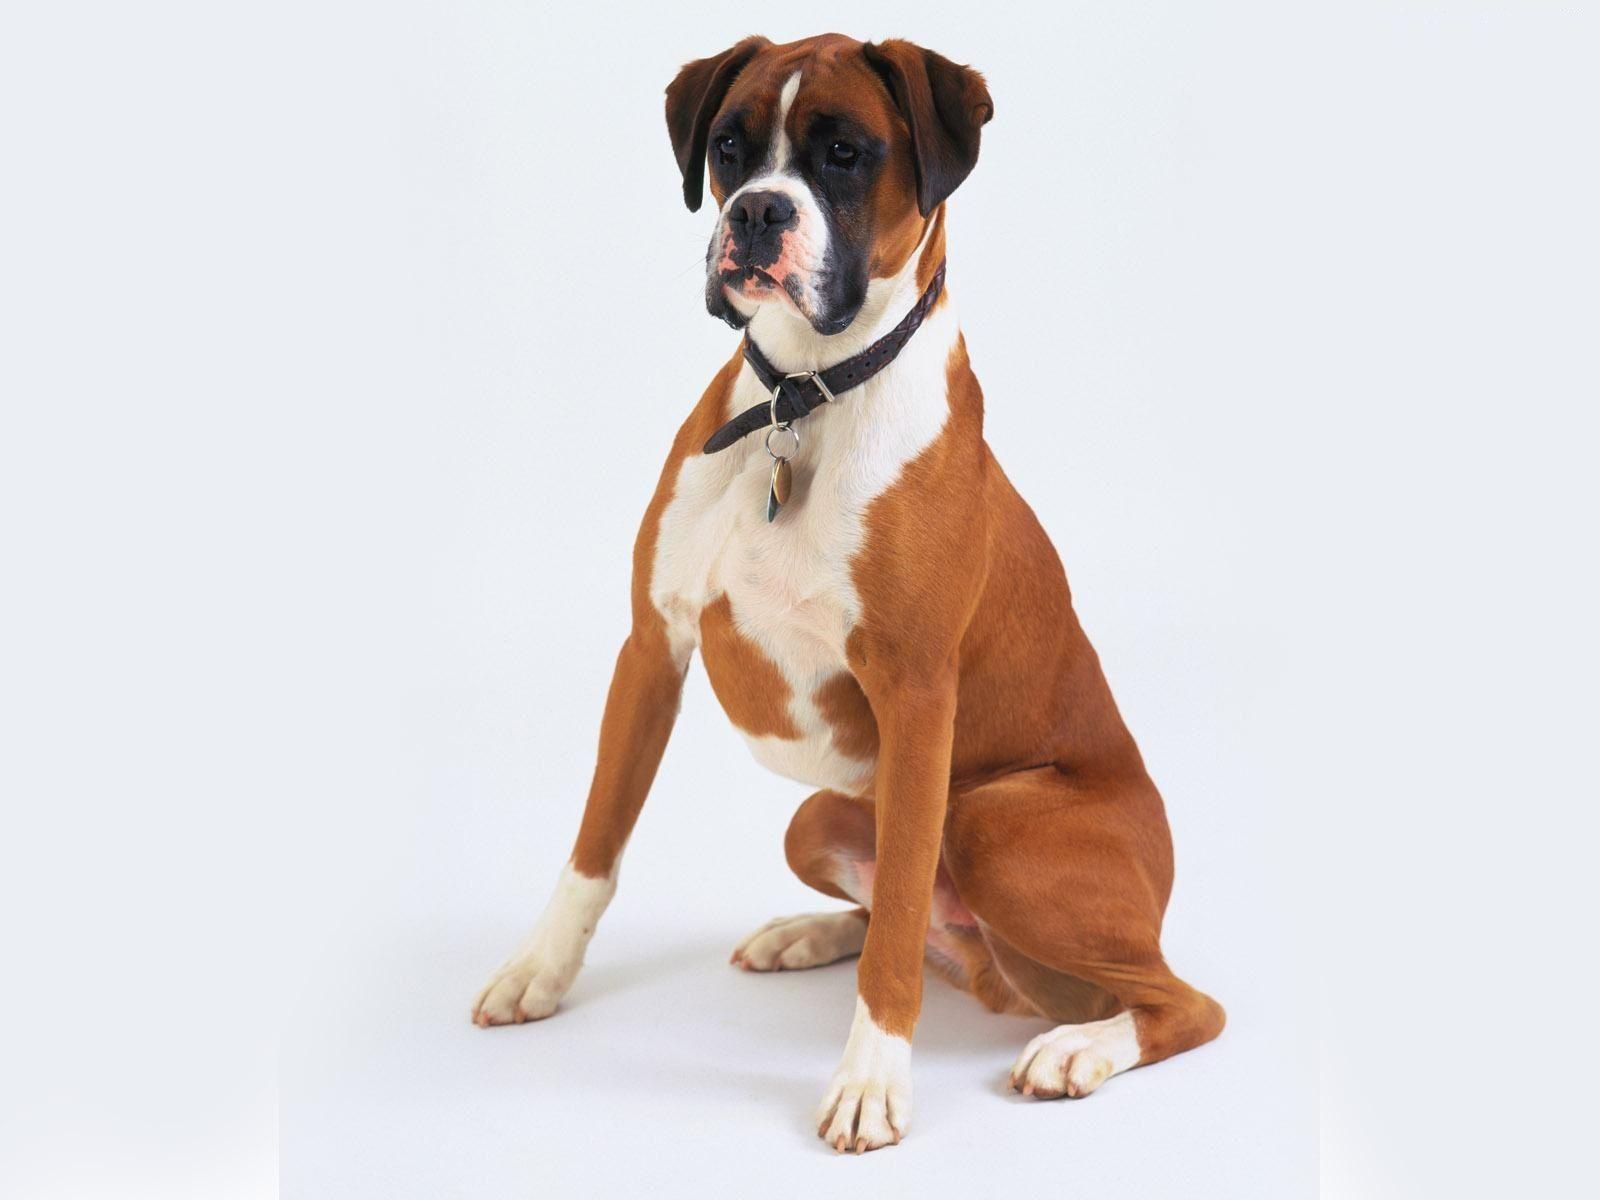 Boxer Puppies Wallpapers - Wallpaper Cave  |Boxer Puppies Wallpaper